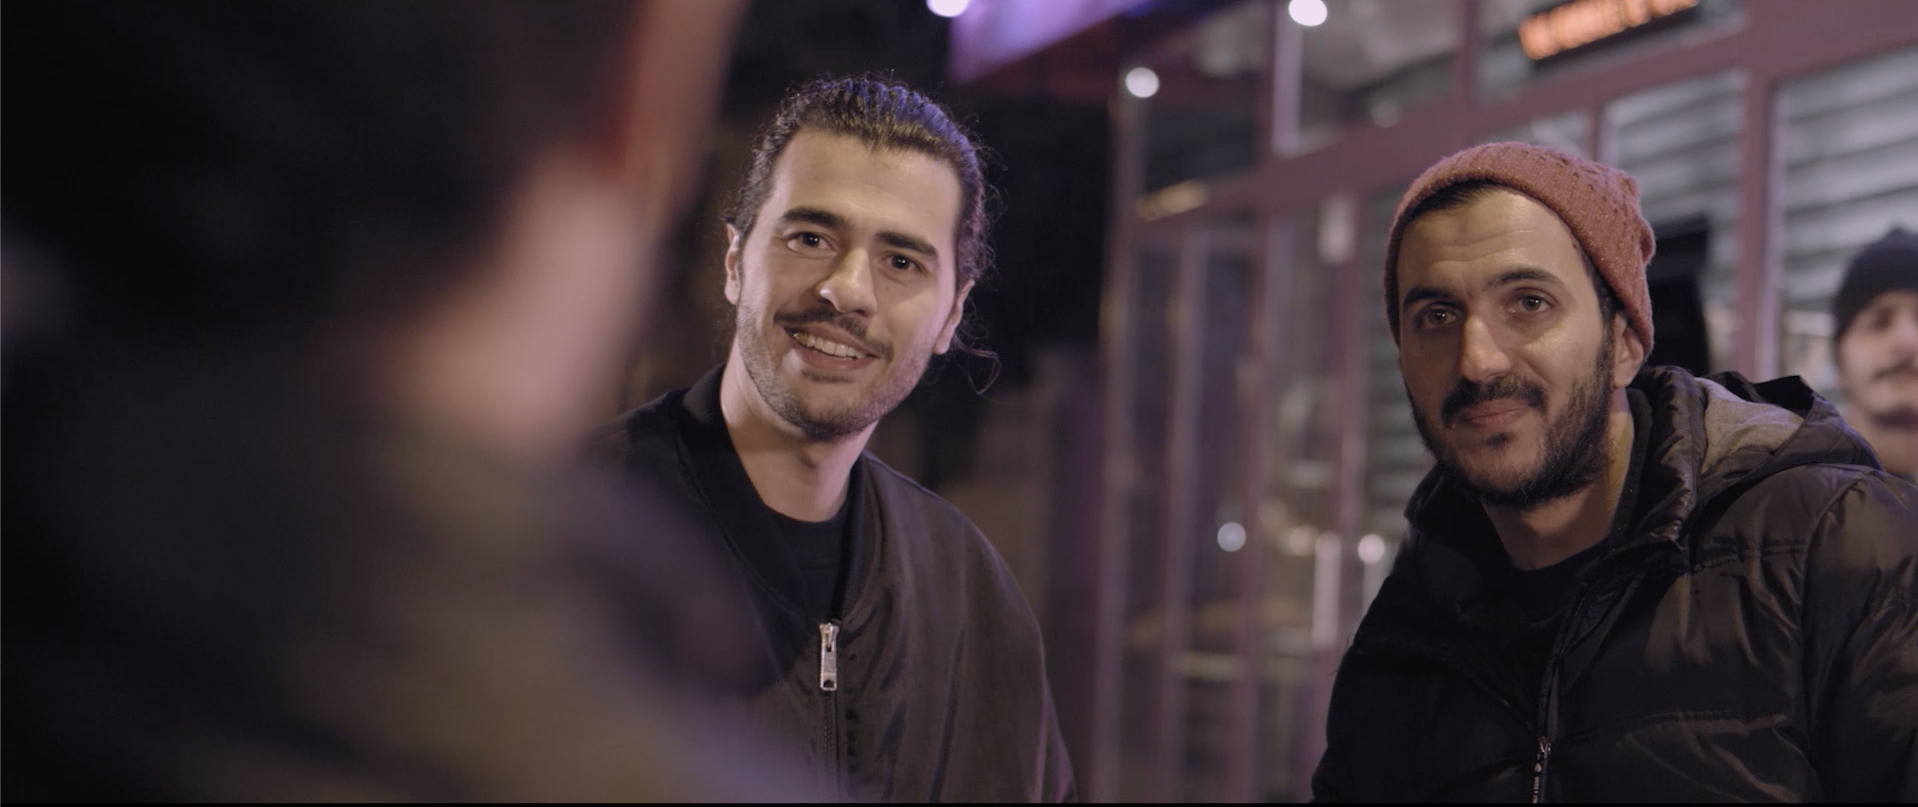 Richard Sabak et Fouad Hachani